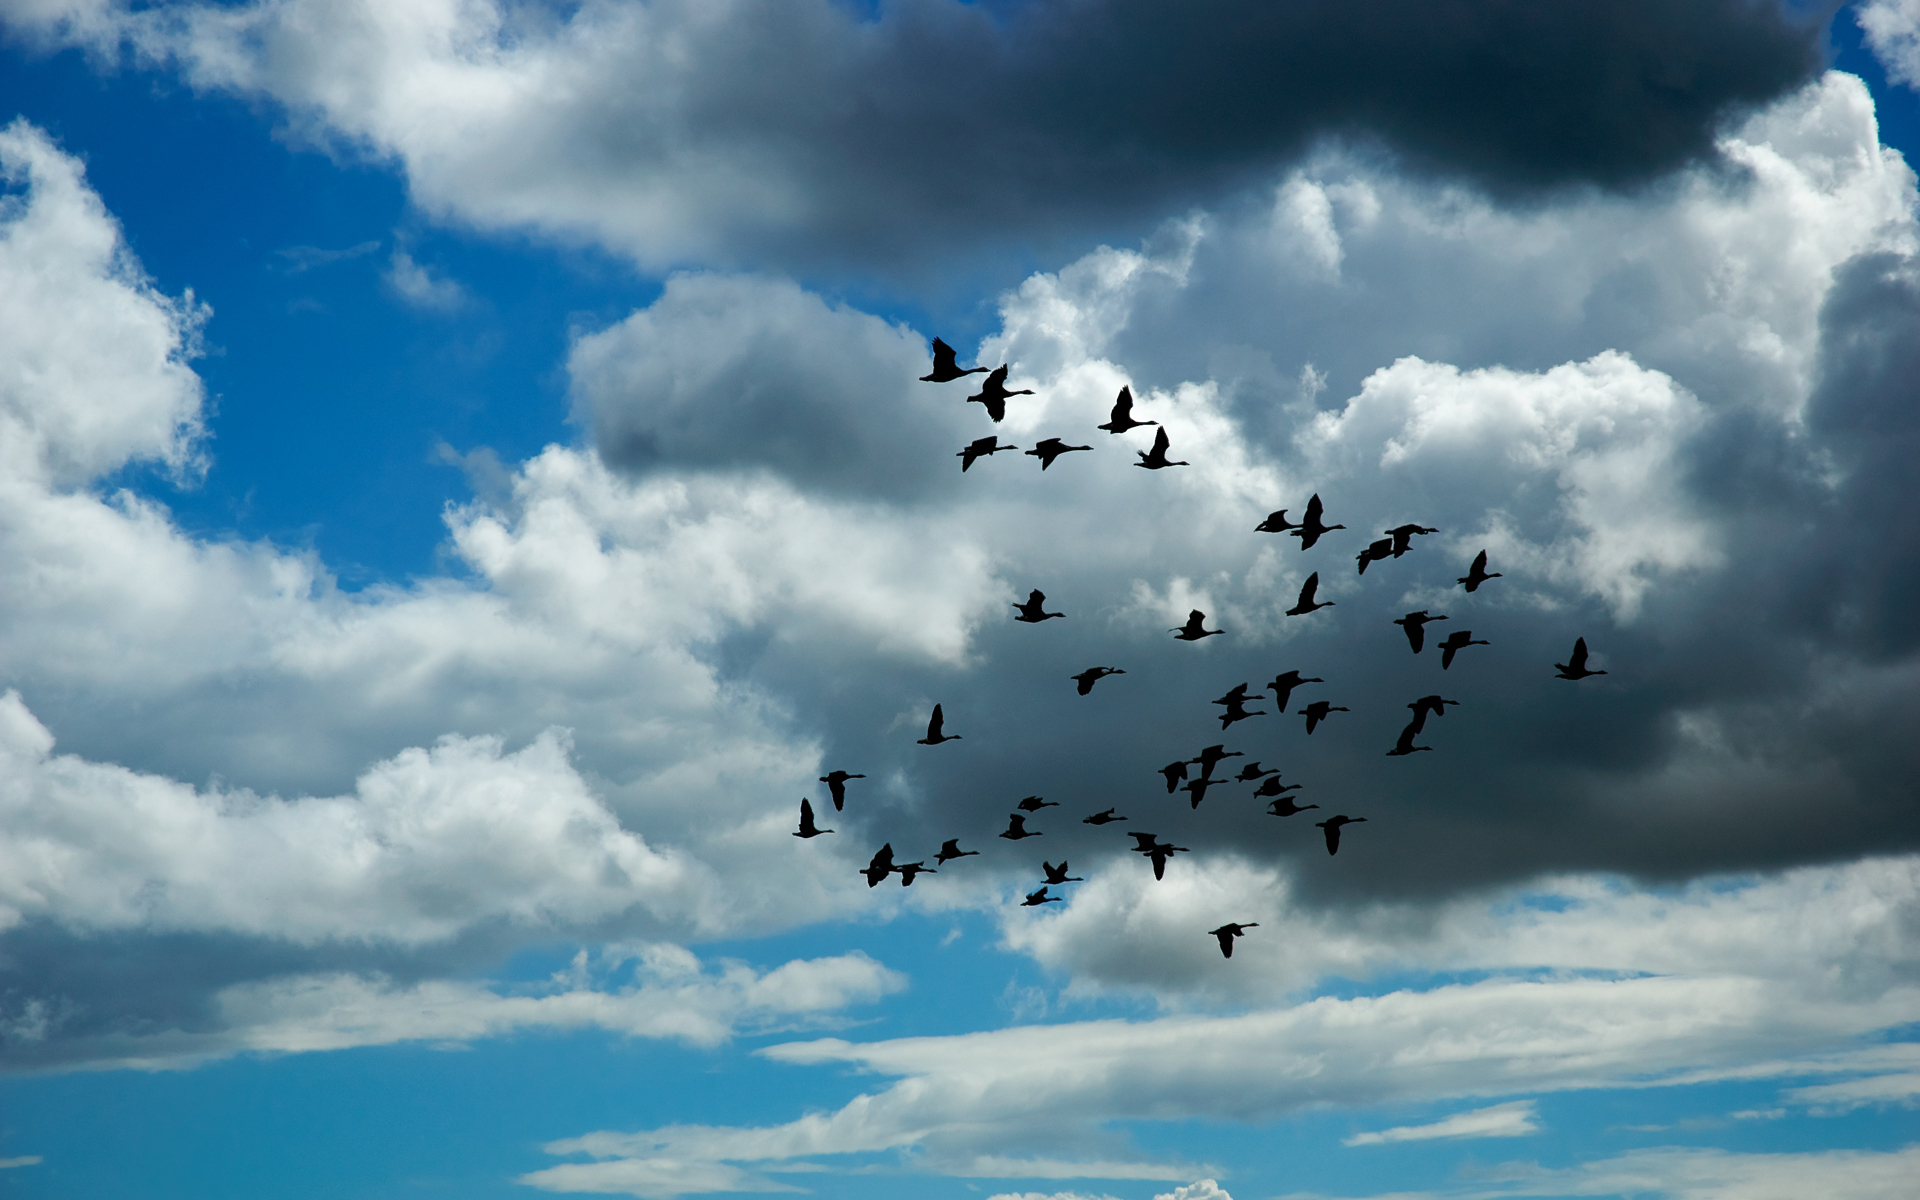 Wallpapers Hd Flying Birds Apple Animals Blue Sky Desktop: Flock Of Birds Sky Bokeh (28) Wallpaper